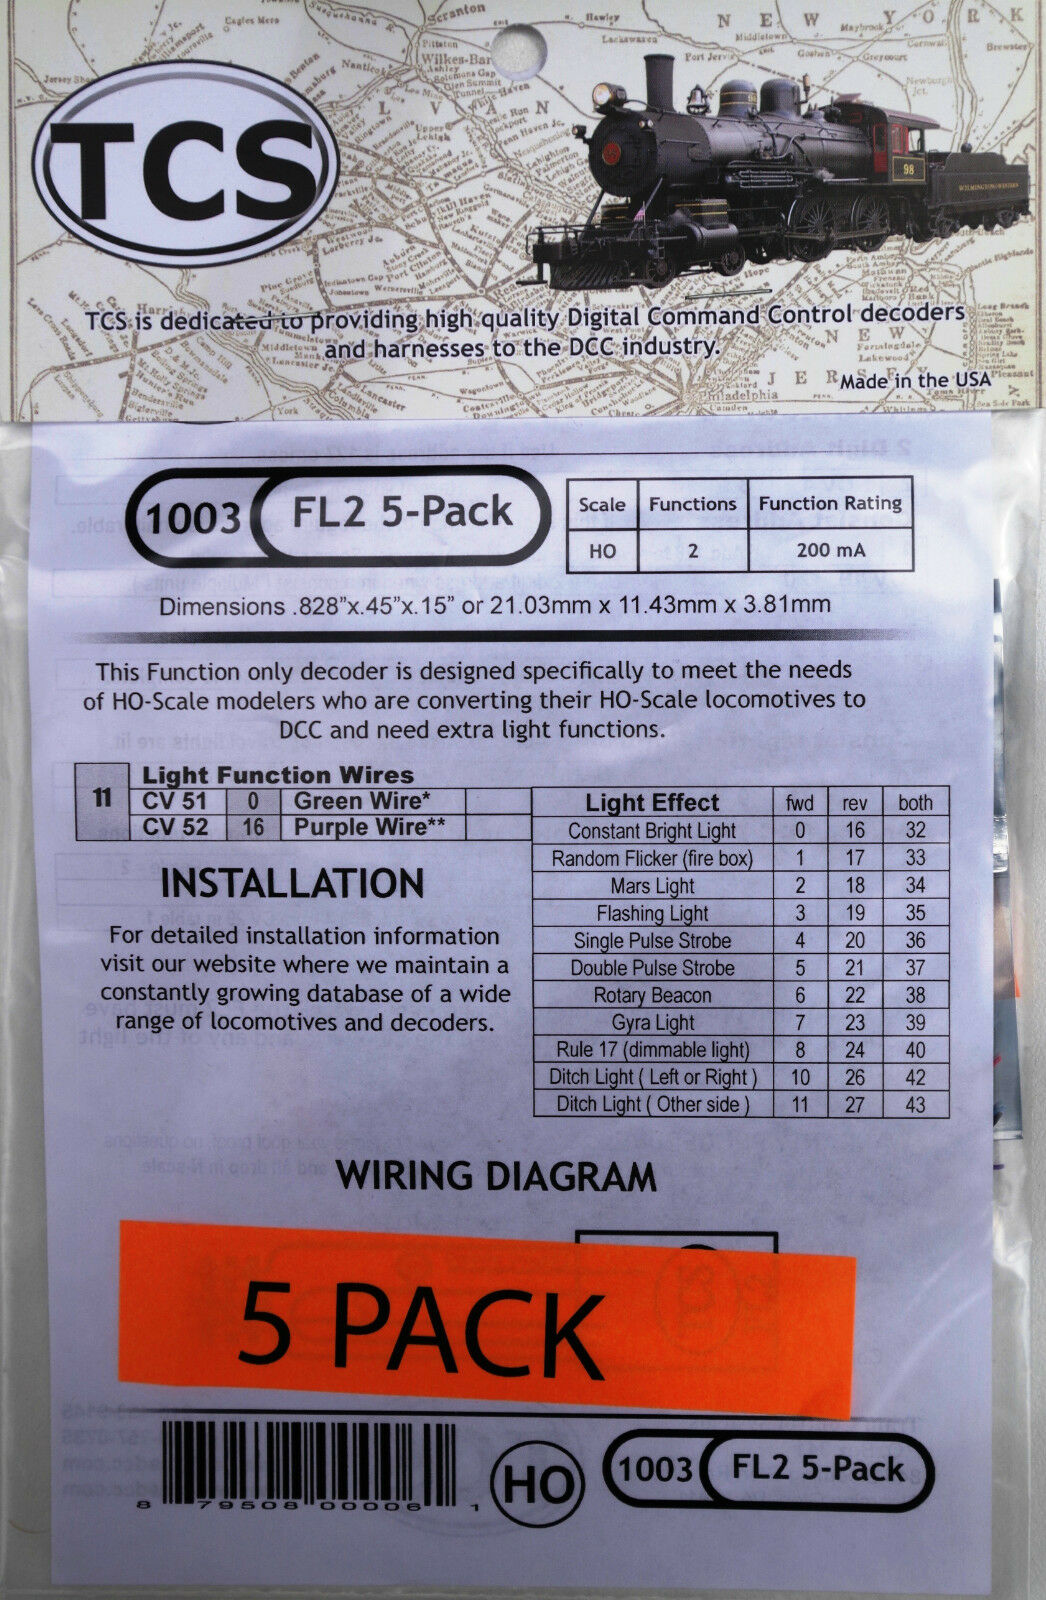 DCC decoder TCS FL2, divertimentoction Only,2 lighting divertimentoctions  5 Pack